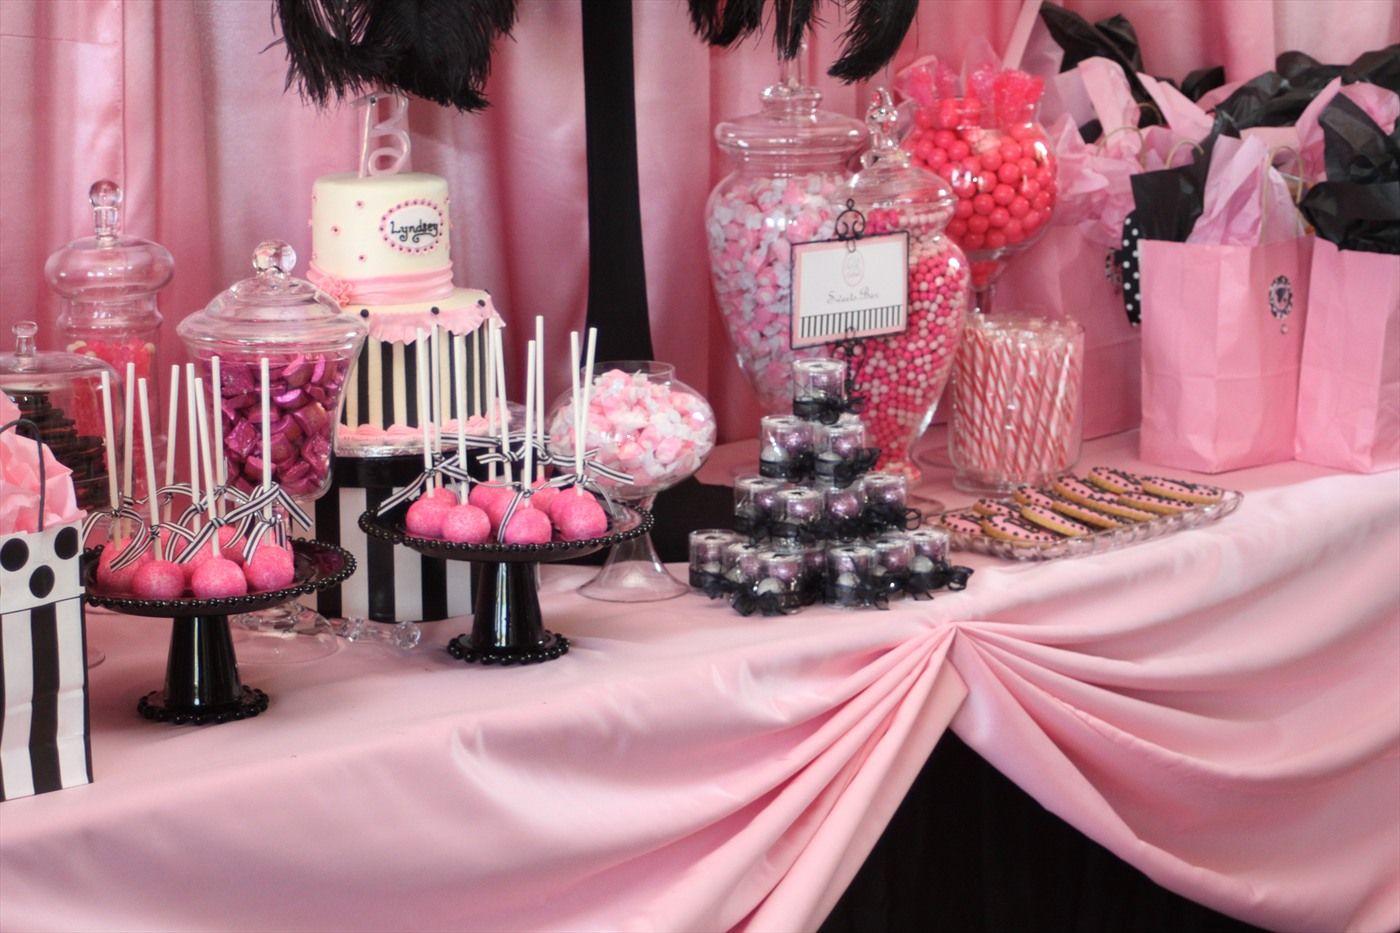 Parisian party candy/treat buffet | Birthday | Pinterest | Bar ...